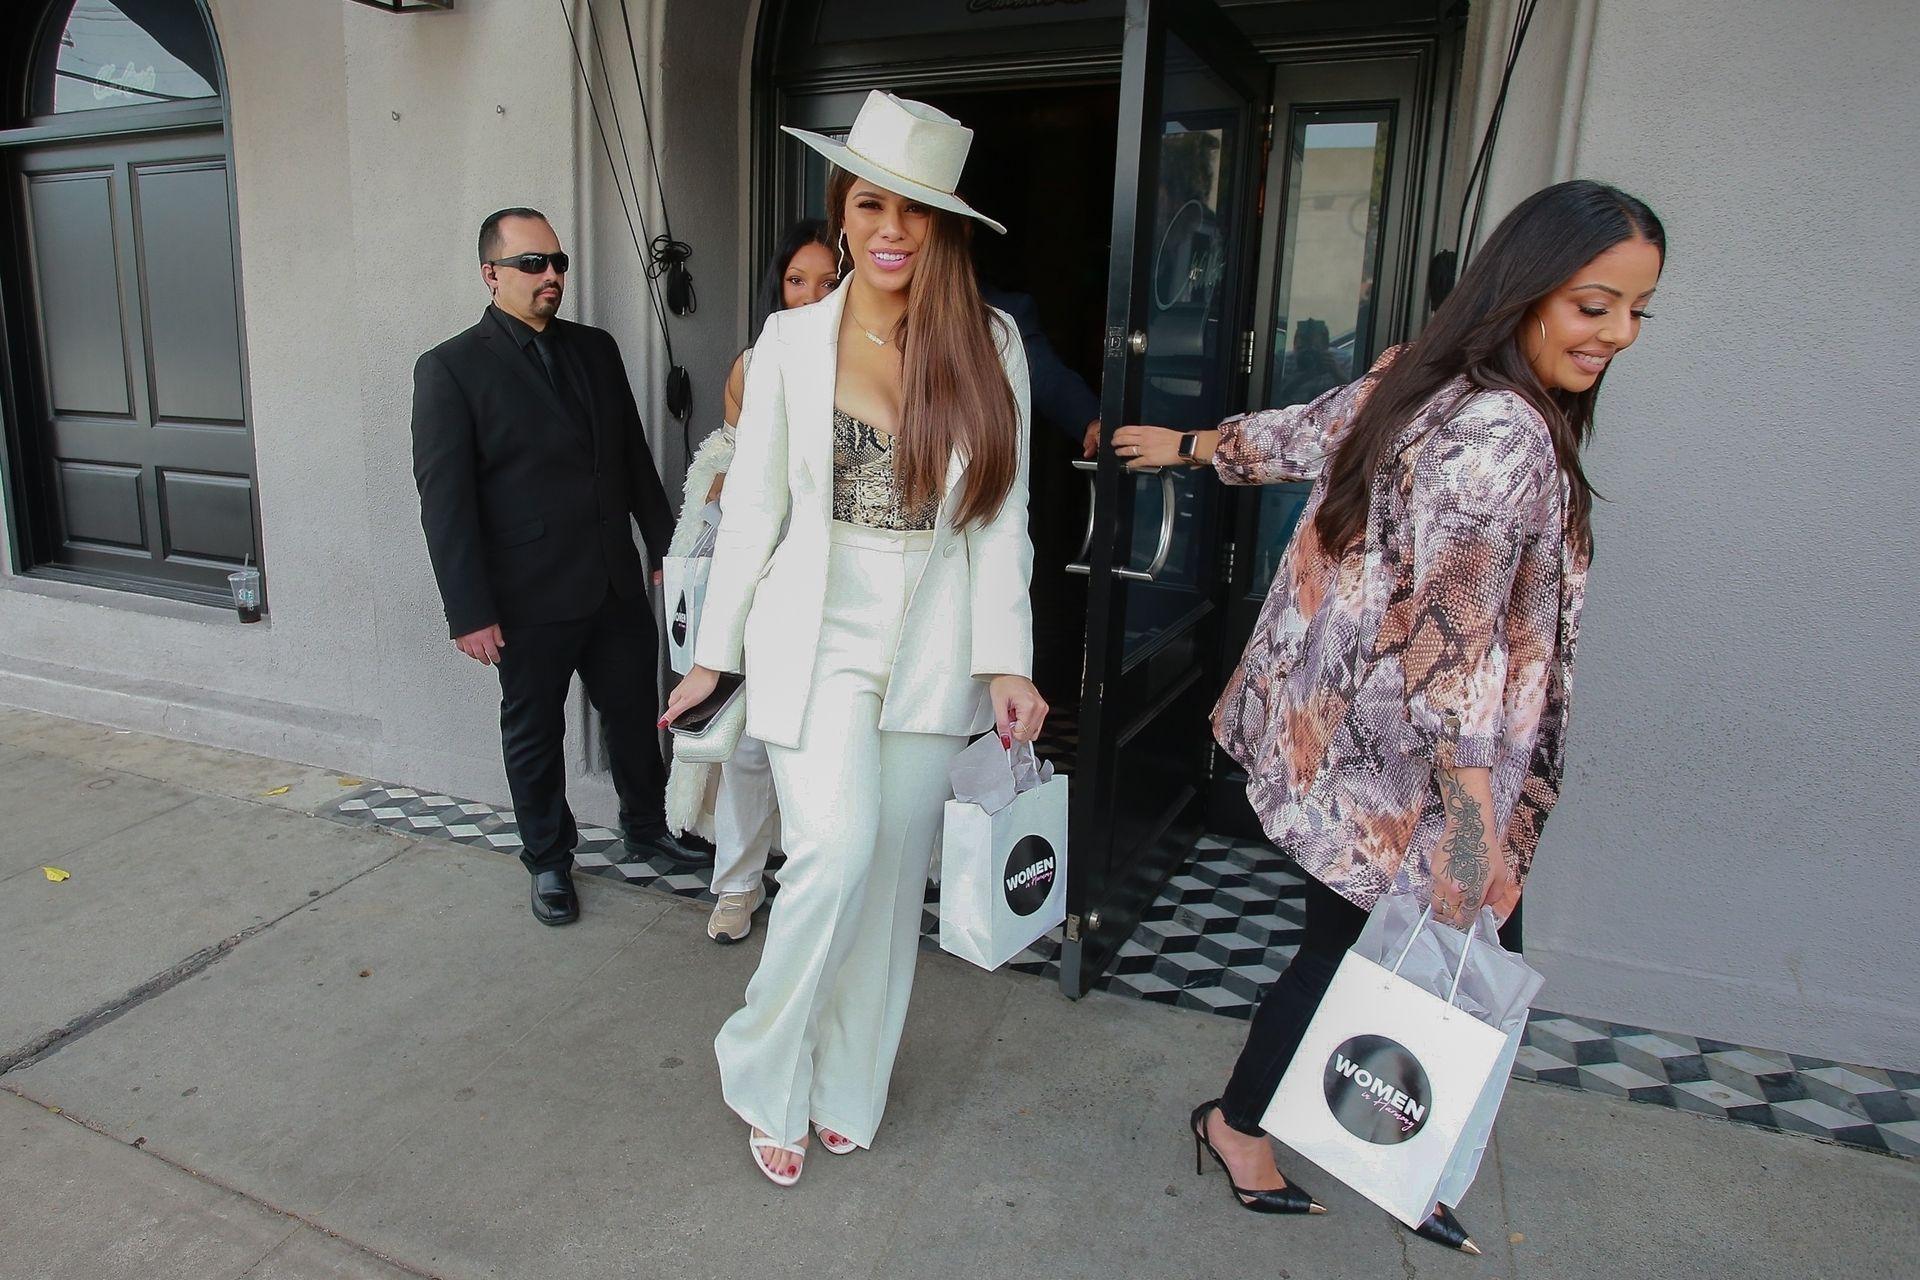 Dinah Jane Departs The Women In Harmony Pre Grammy Luncheon 0007